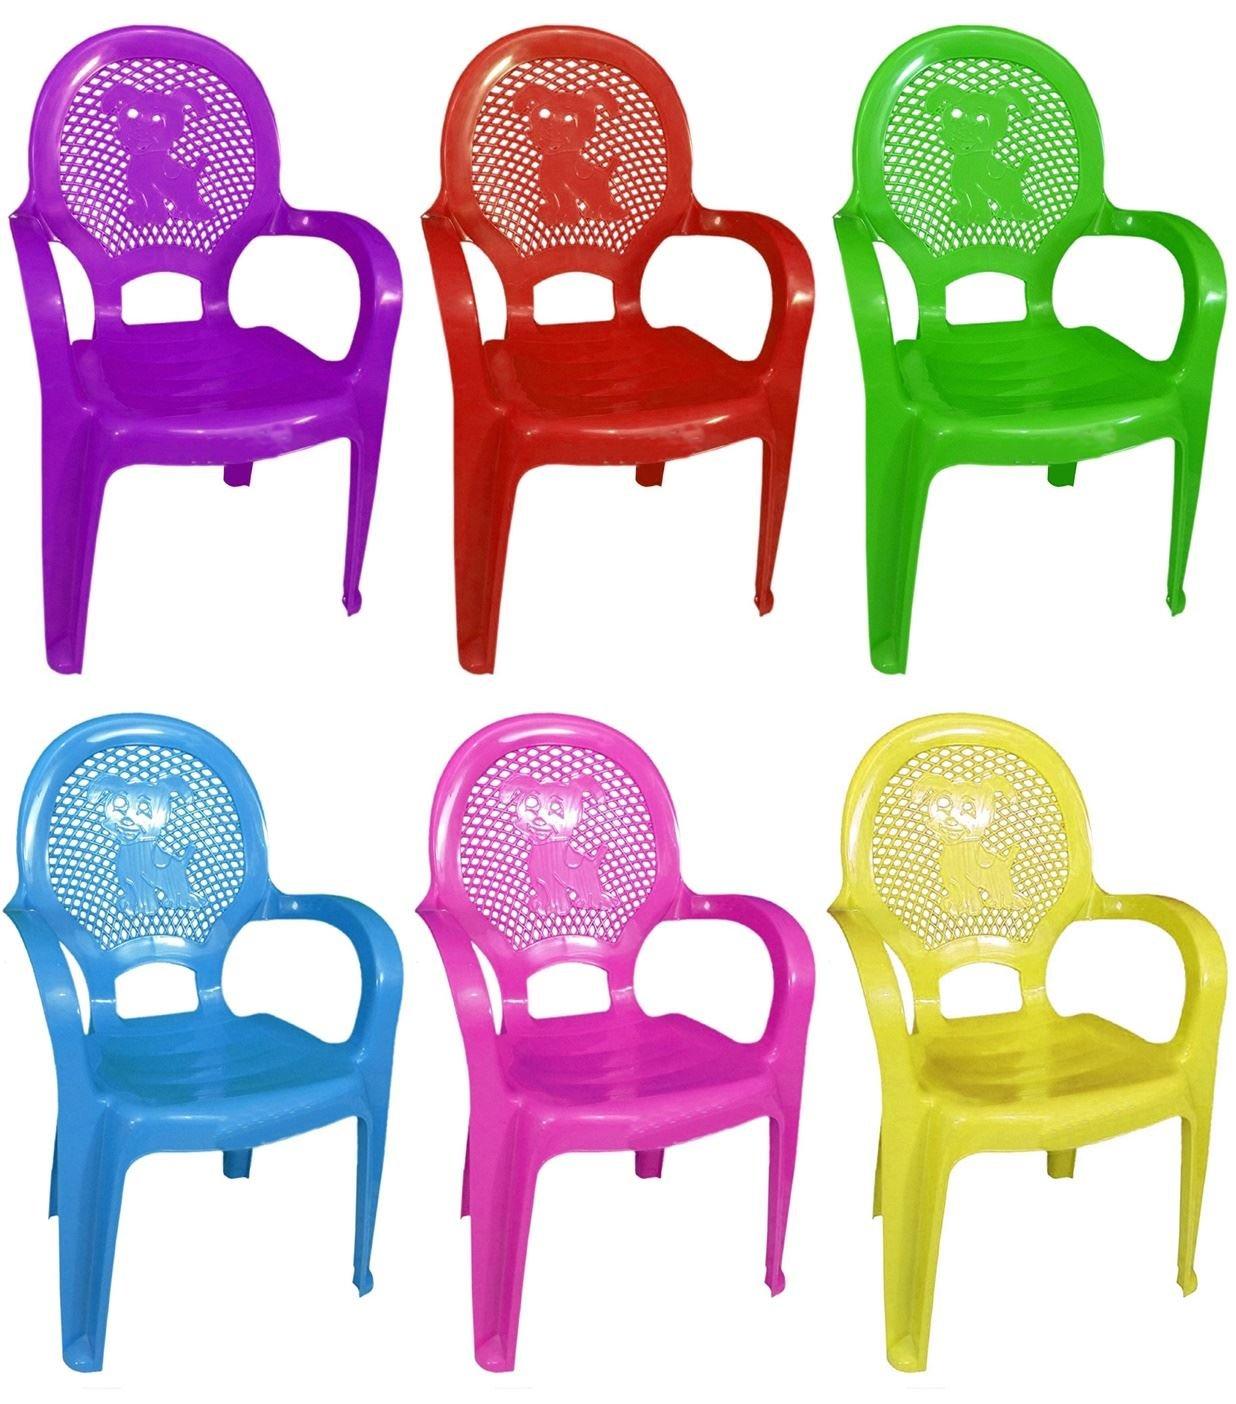 Assorted Colour Stackable Kids Children Plastic Chair Home Picnic Party Nursery Tea School 30kg Furniture Garden Clubs Seat Concept4u